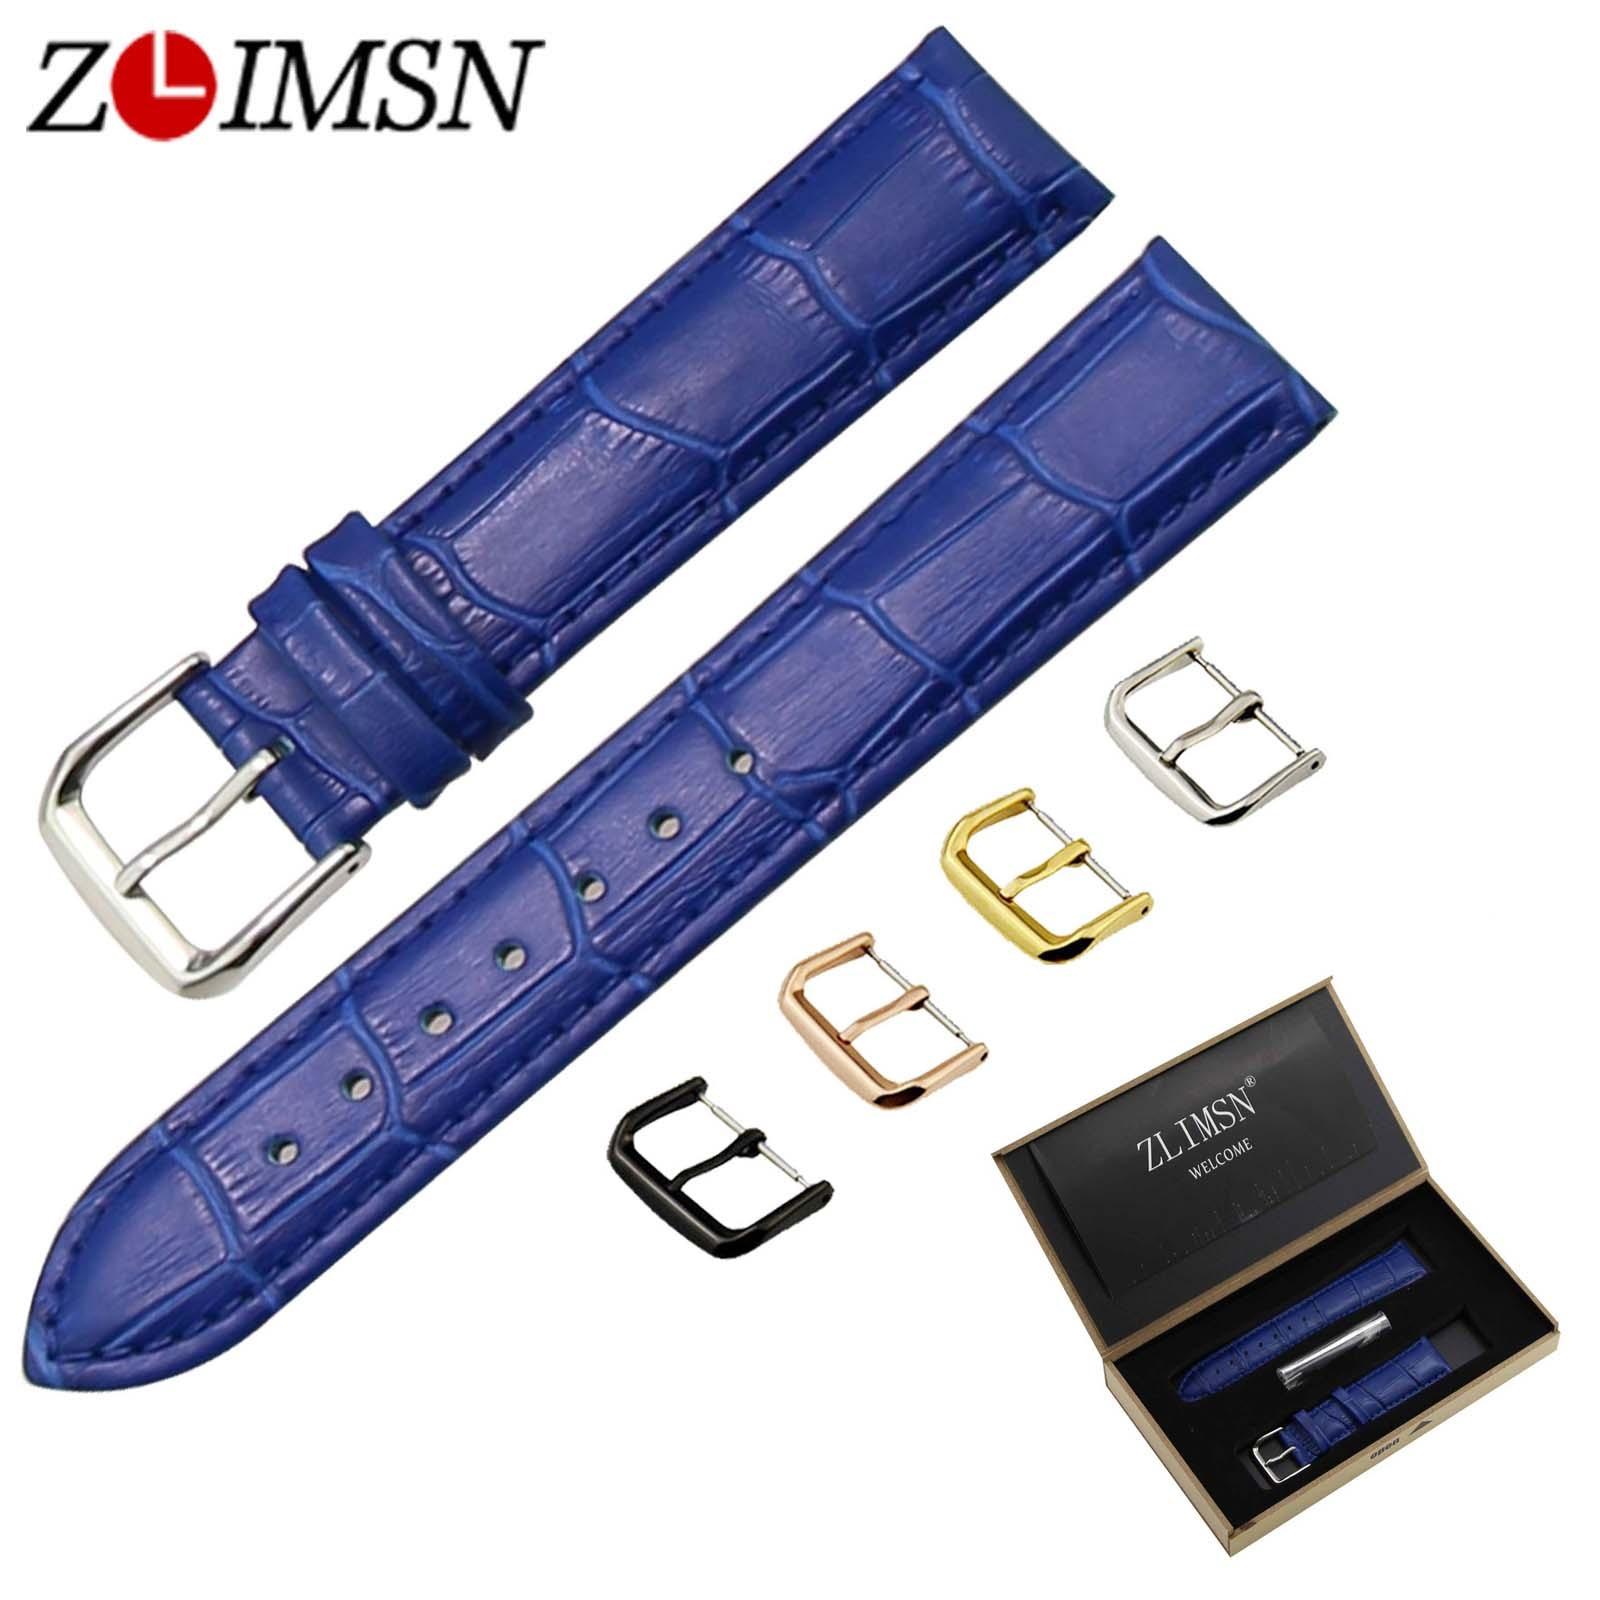 ZLIMSN Italian Genuine Leather Watch Band Blue Crocodile & Grain Strap Gold Black Silver Rose Gold Pin Buckle 12 14 16 18 20mm crocodile crocodile cr225r black silver